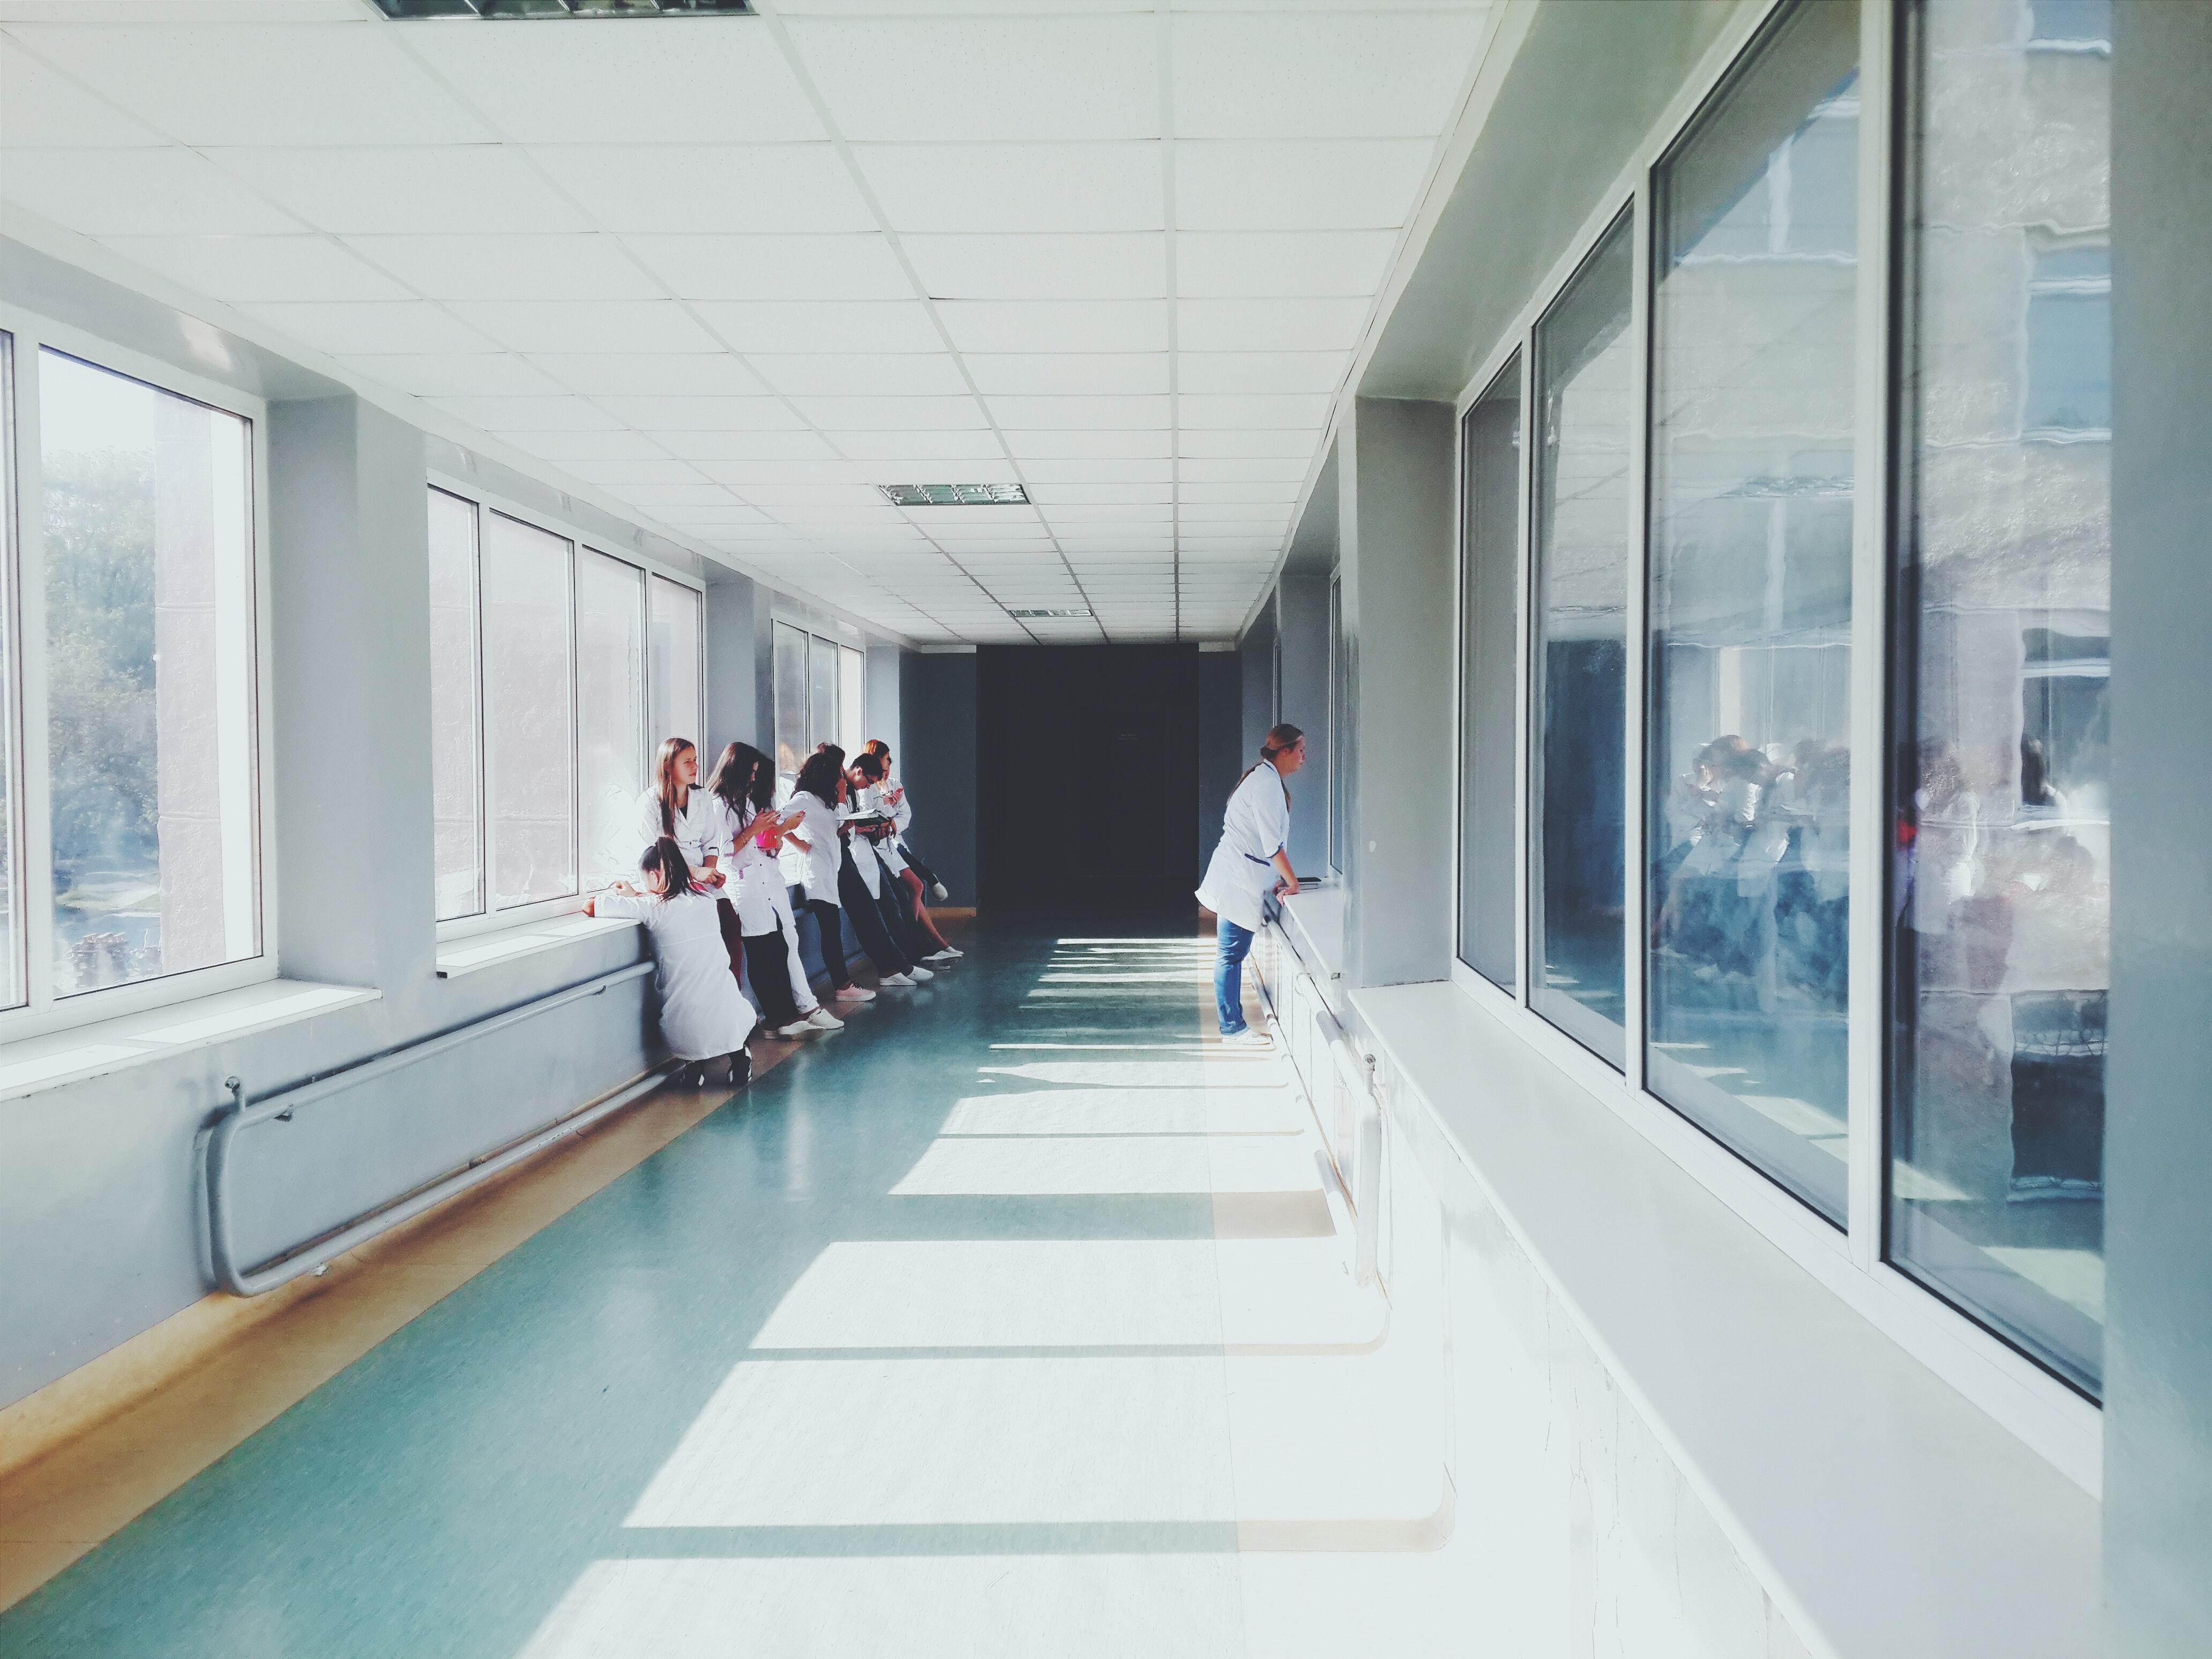 Un hôpital. | Photo : Pexels